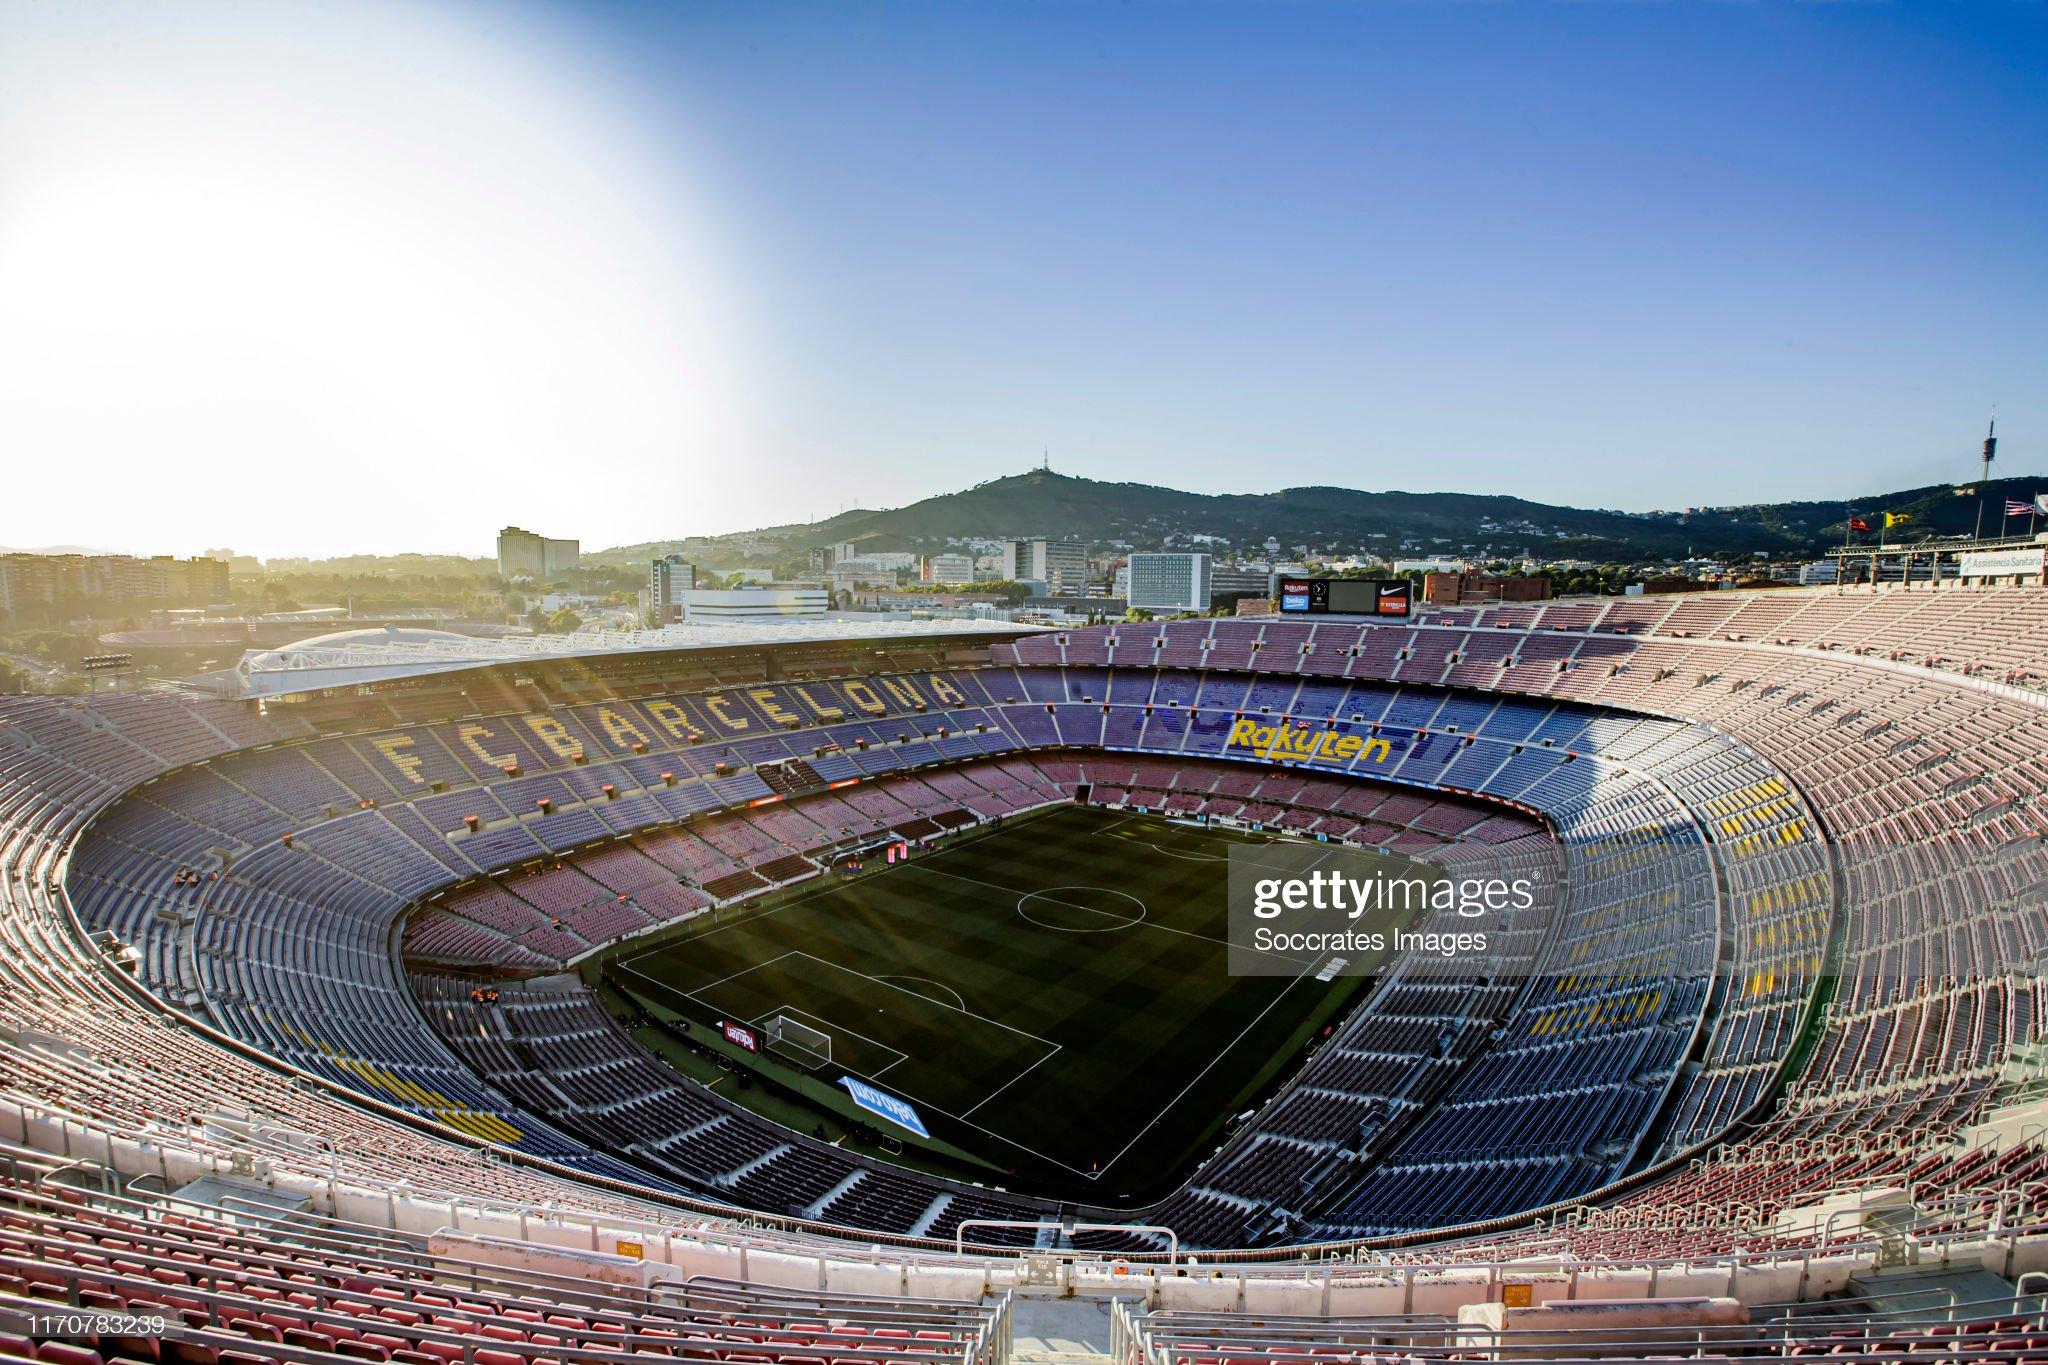 صور مباراة : برشلونة - فياريال 2-1 ( 24-09-2019 )  Stadium-of-fc-barcelona-during-the-la-liga-santander-match-between-fc-picture-id1170783239?s=2048x2048